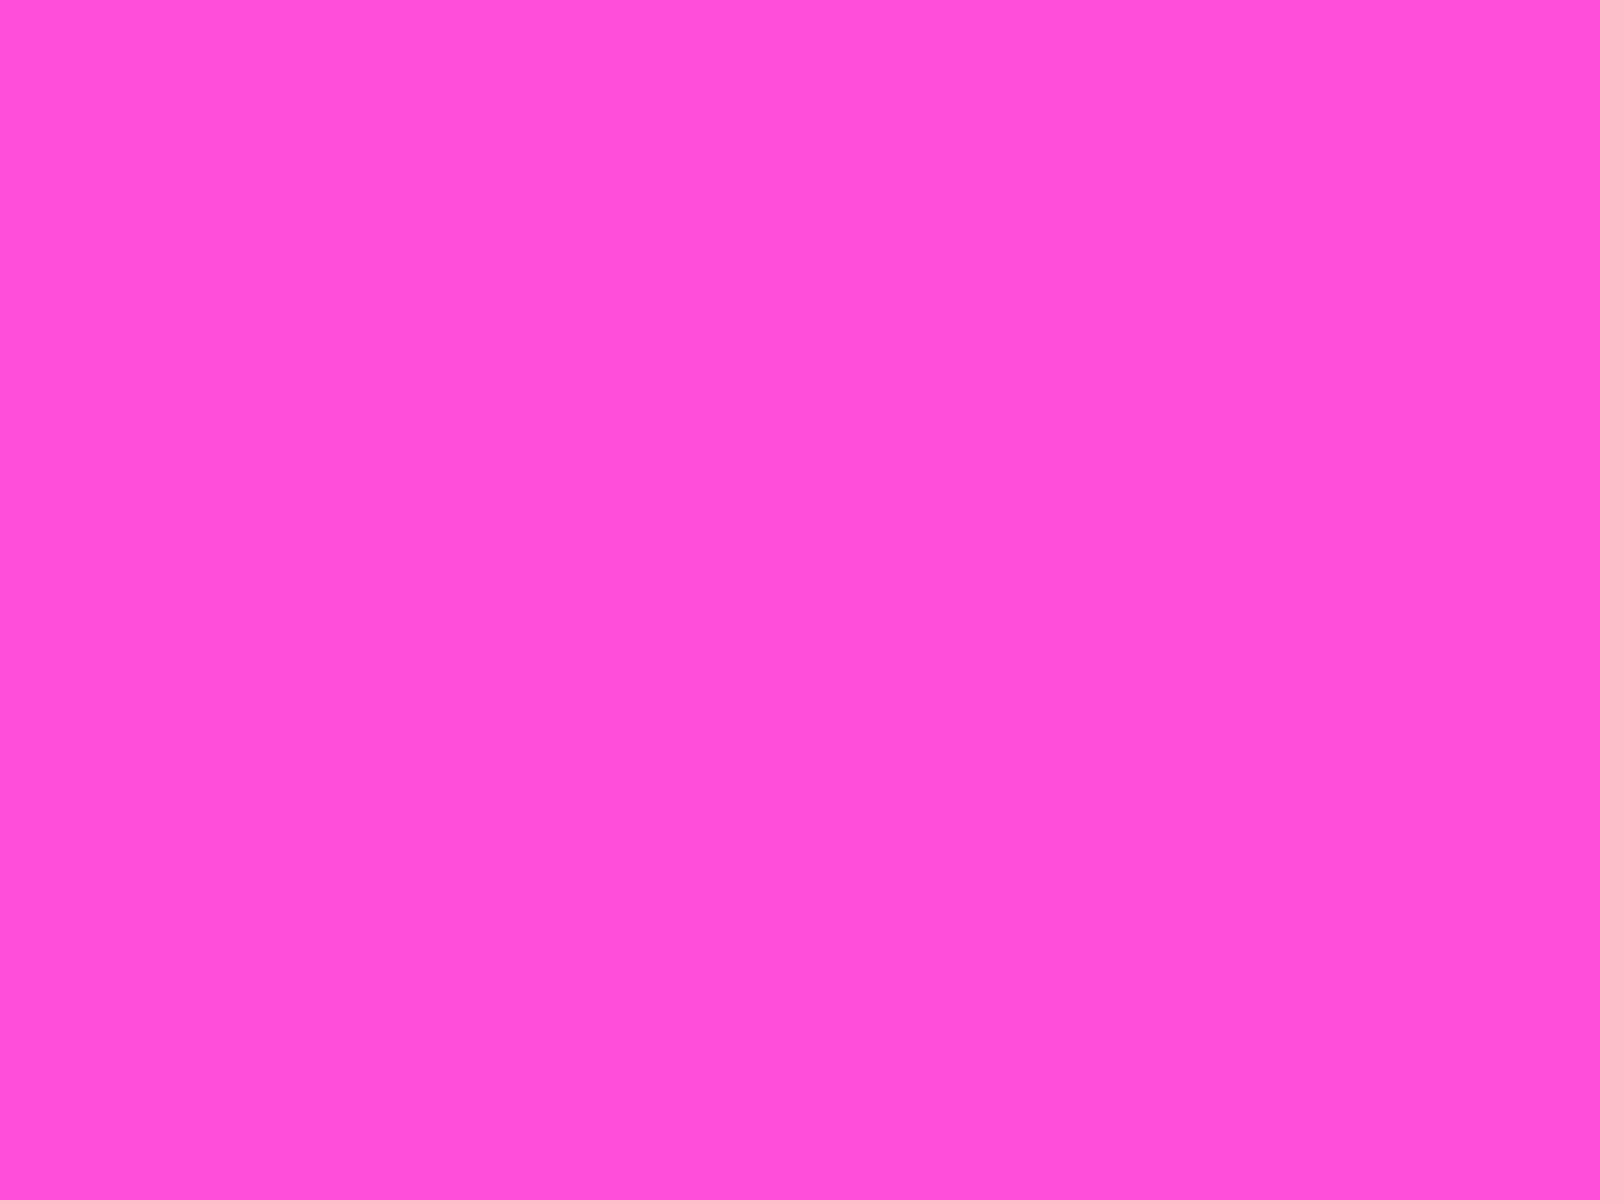 1600x1200 Purple Pizzazz Solid Color Background